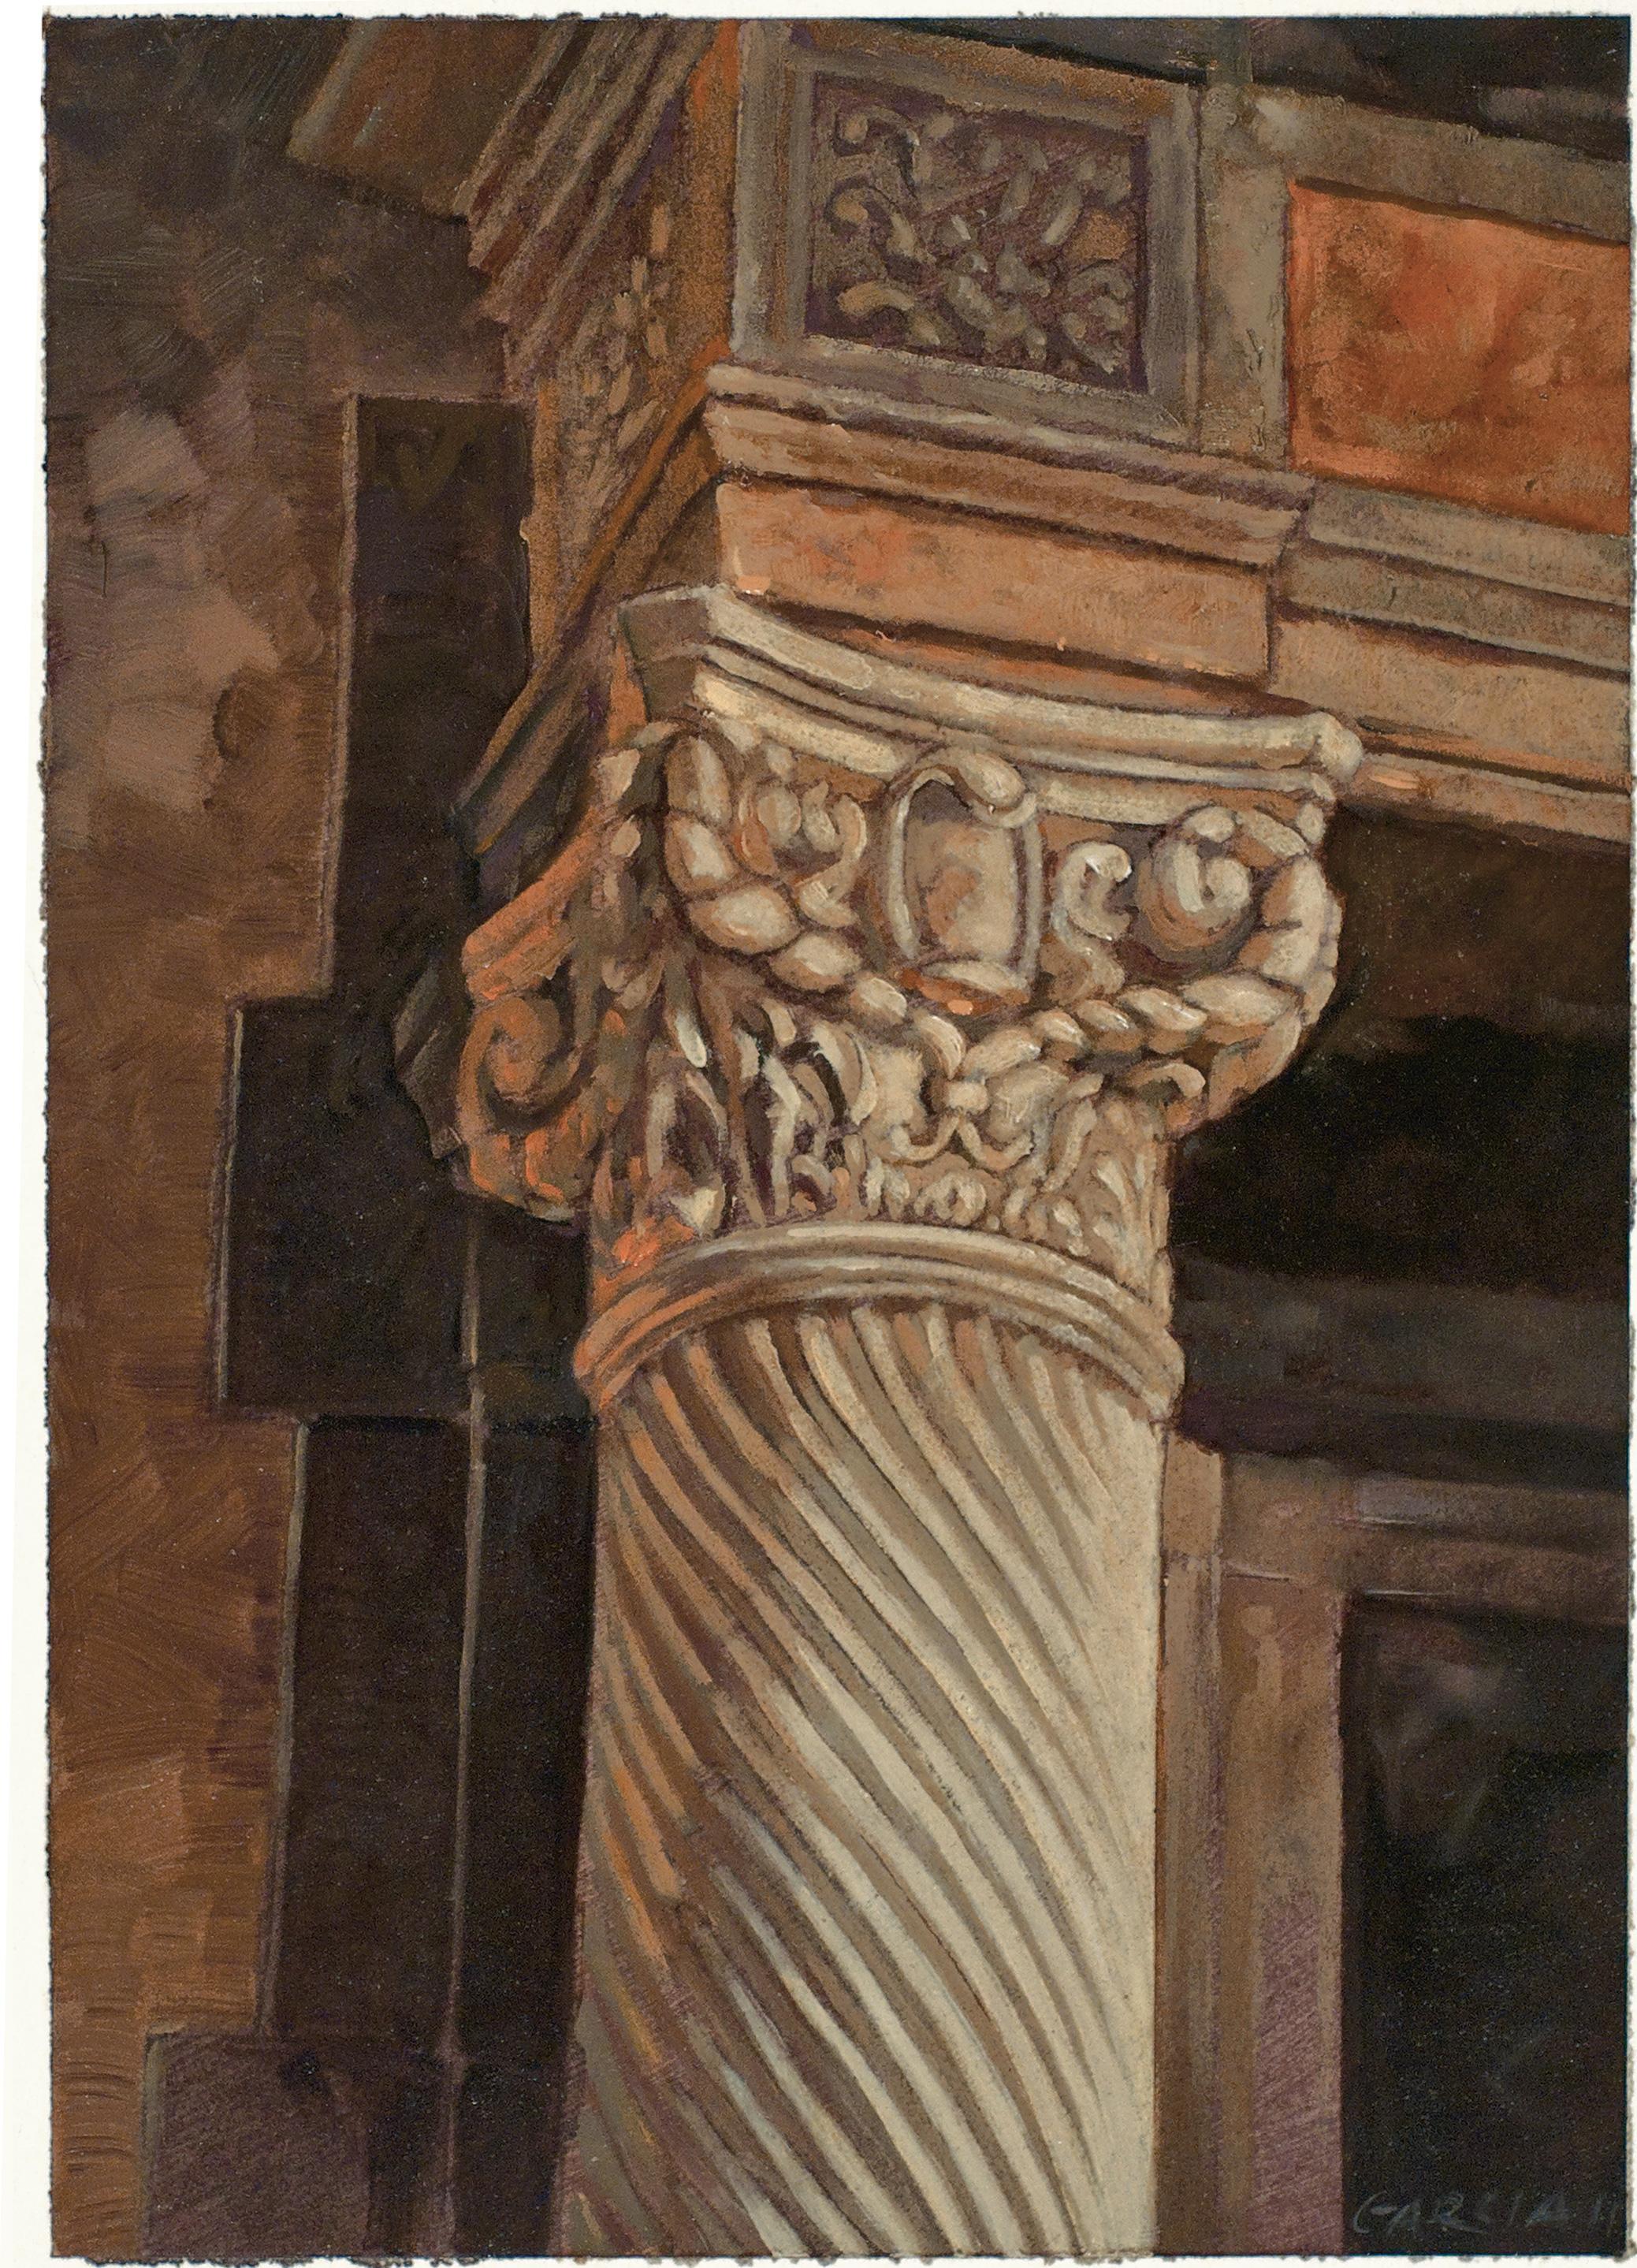 Entry Column design by architect Reginal Johnson